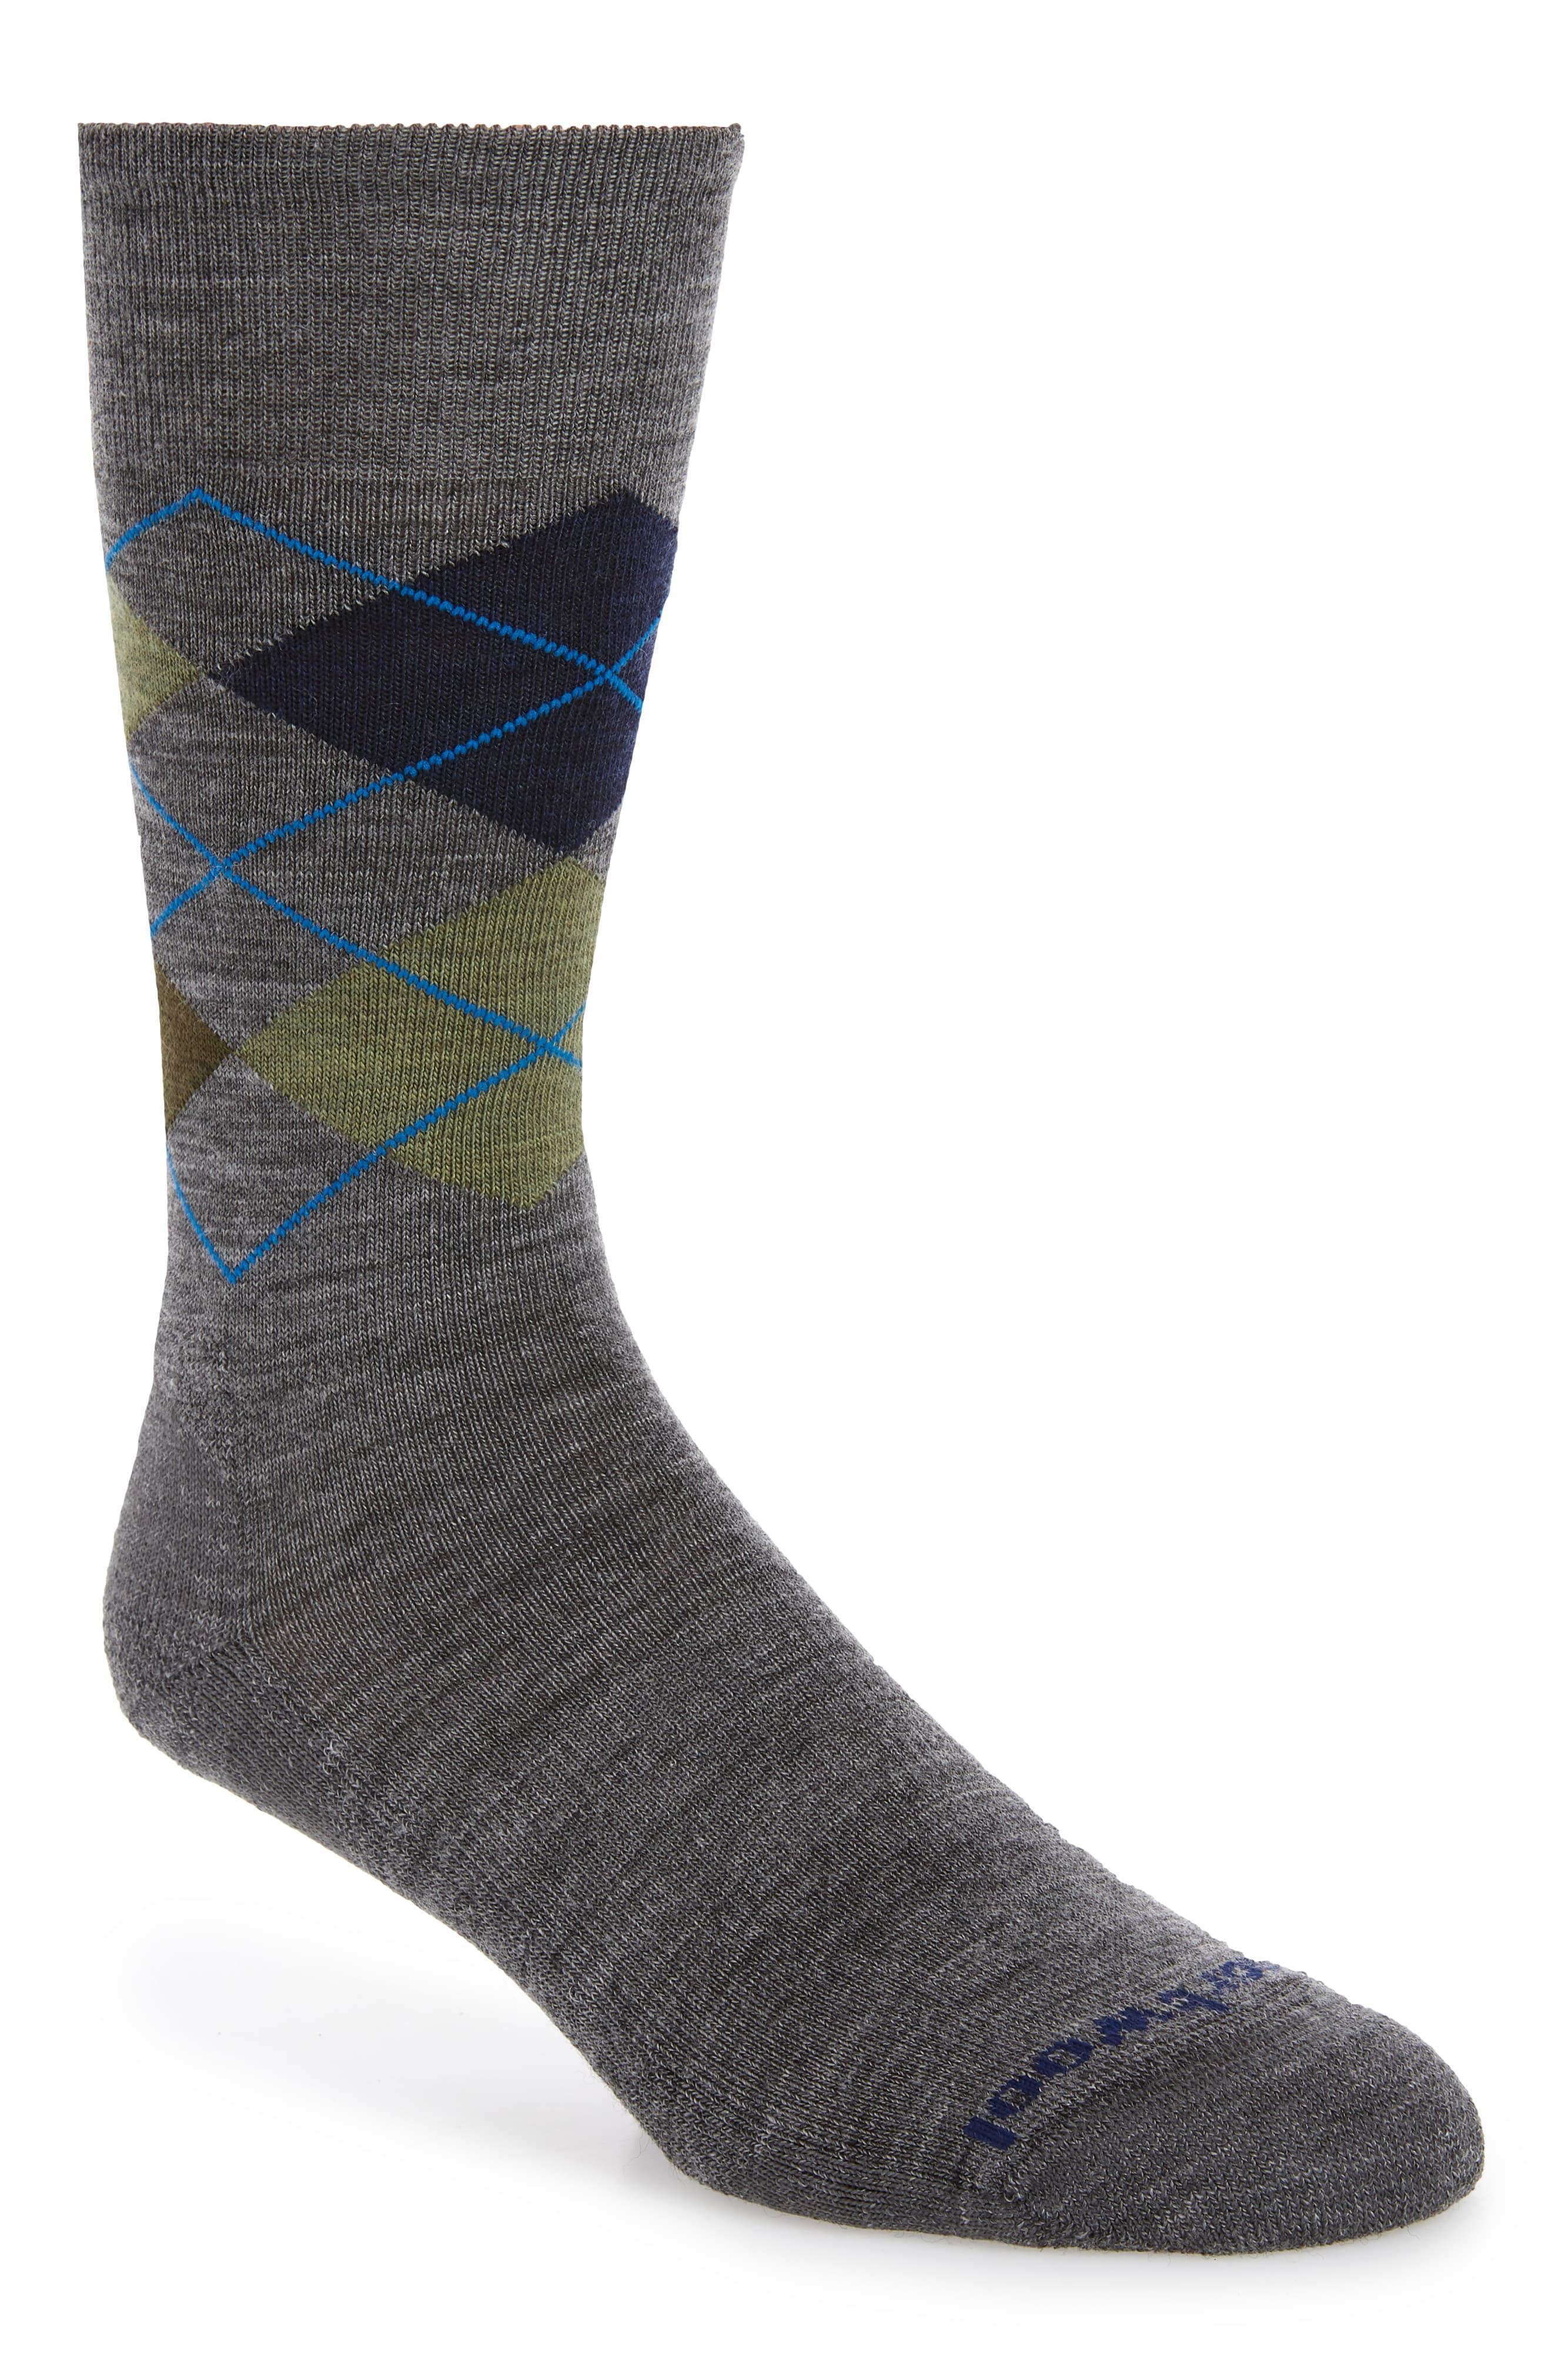 Large Smartwool Mens Diamond Jim Socks Deep Navy Heather//Medium Grey Heather